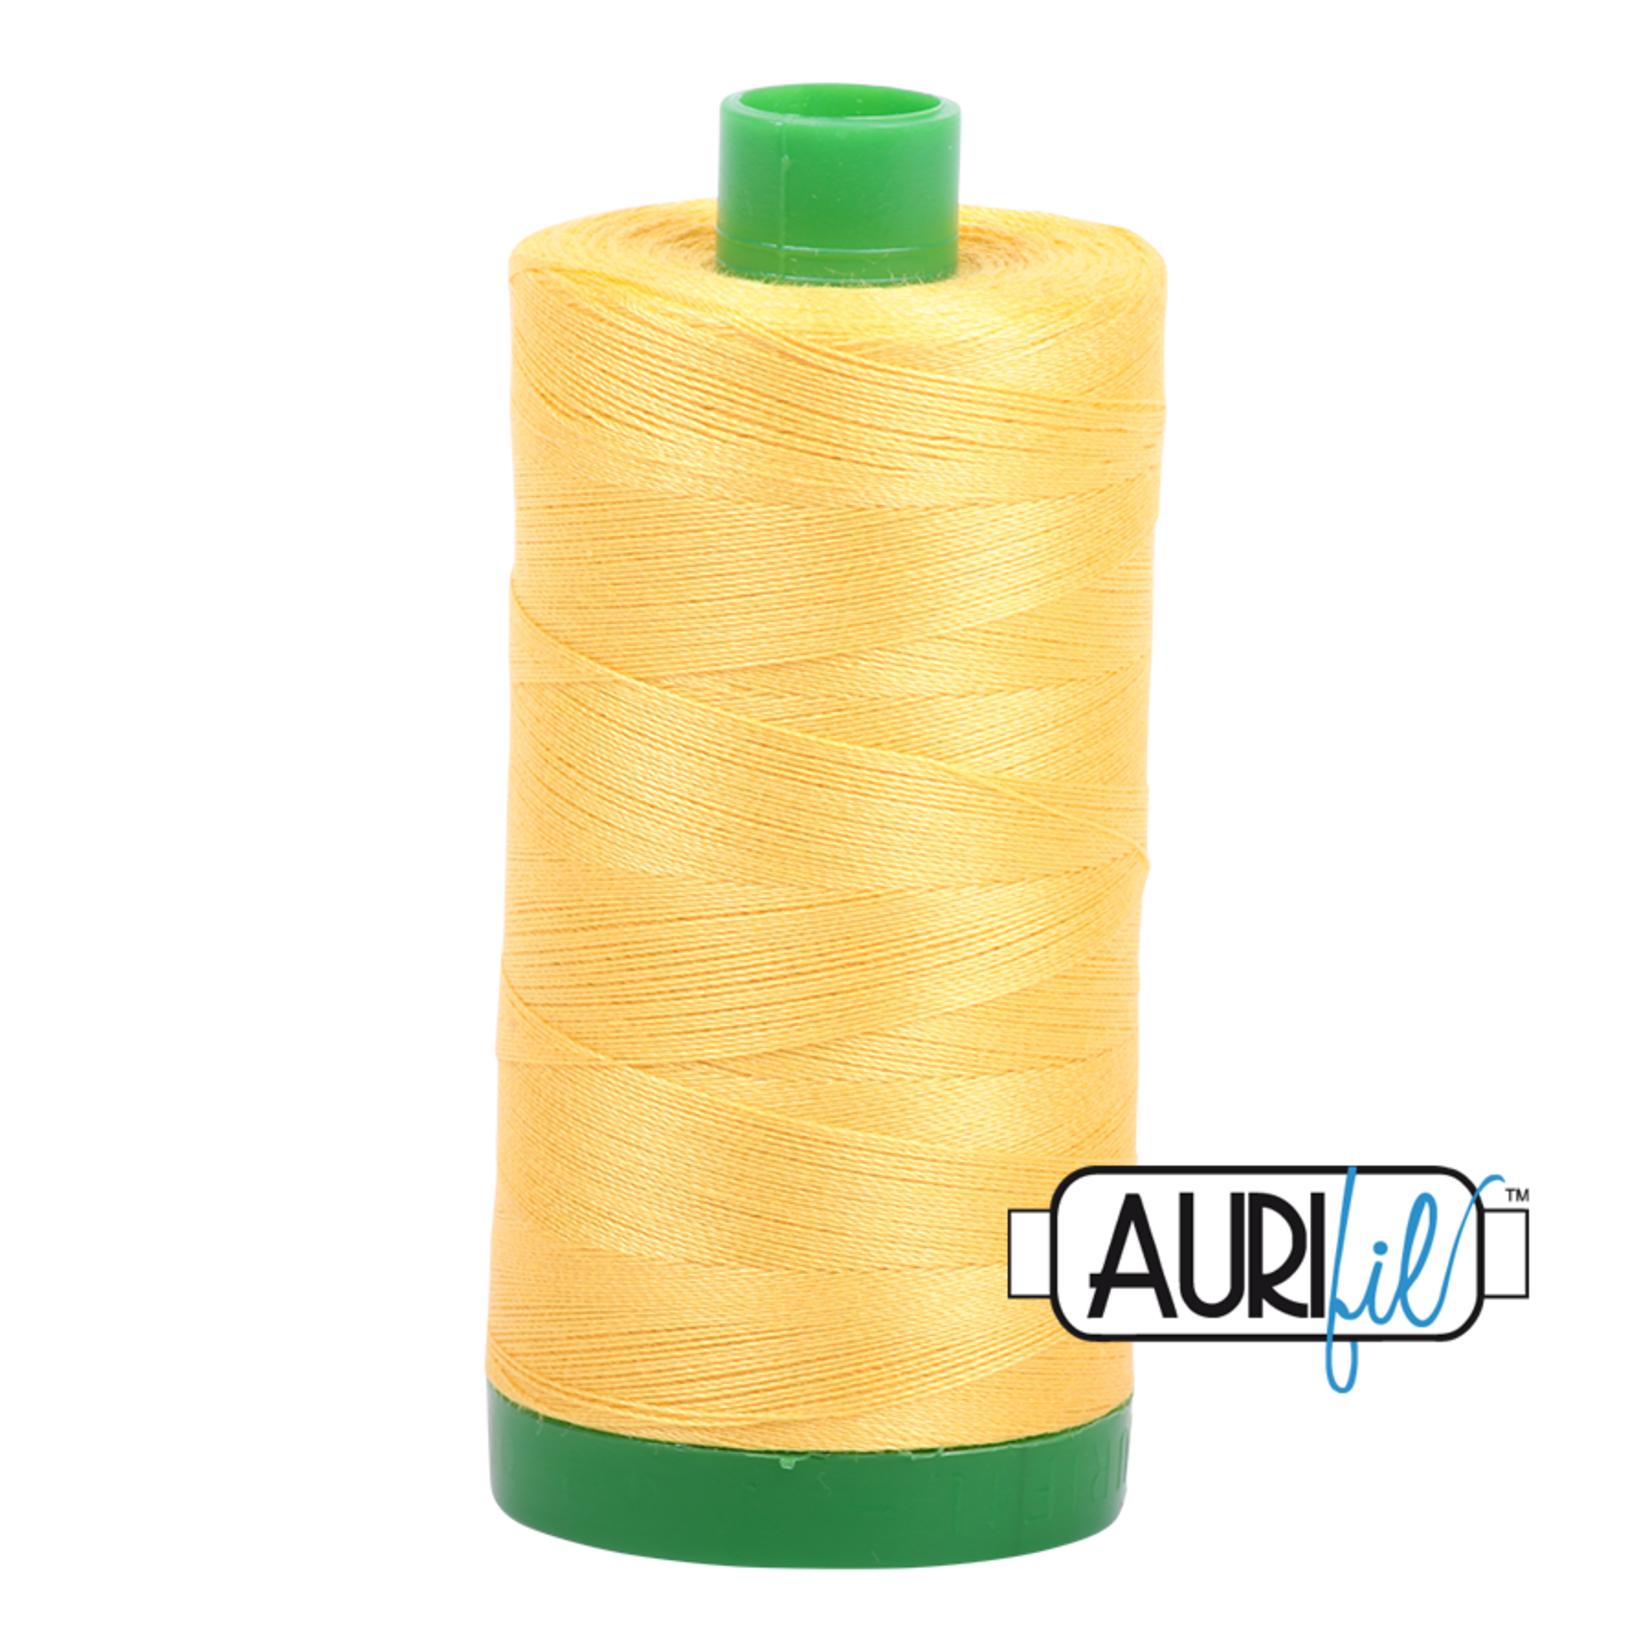 AURIFIL AURIFIL 40 WT Pale Yellow 1135